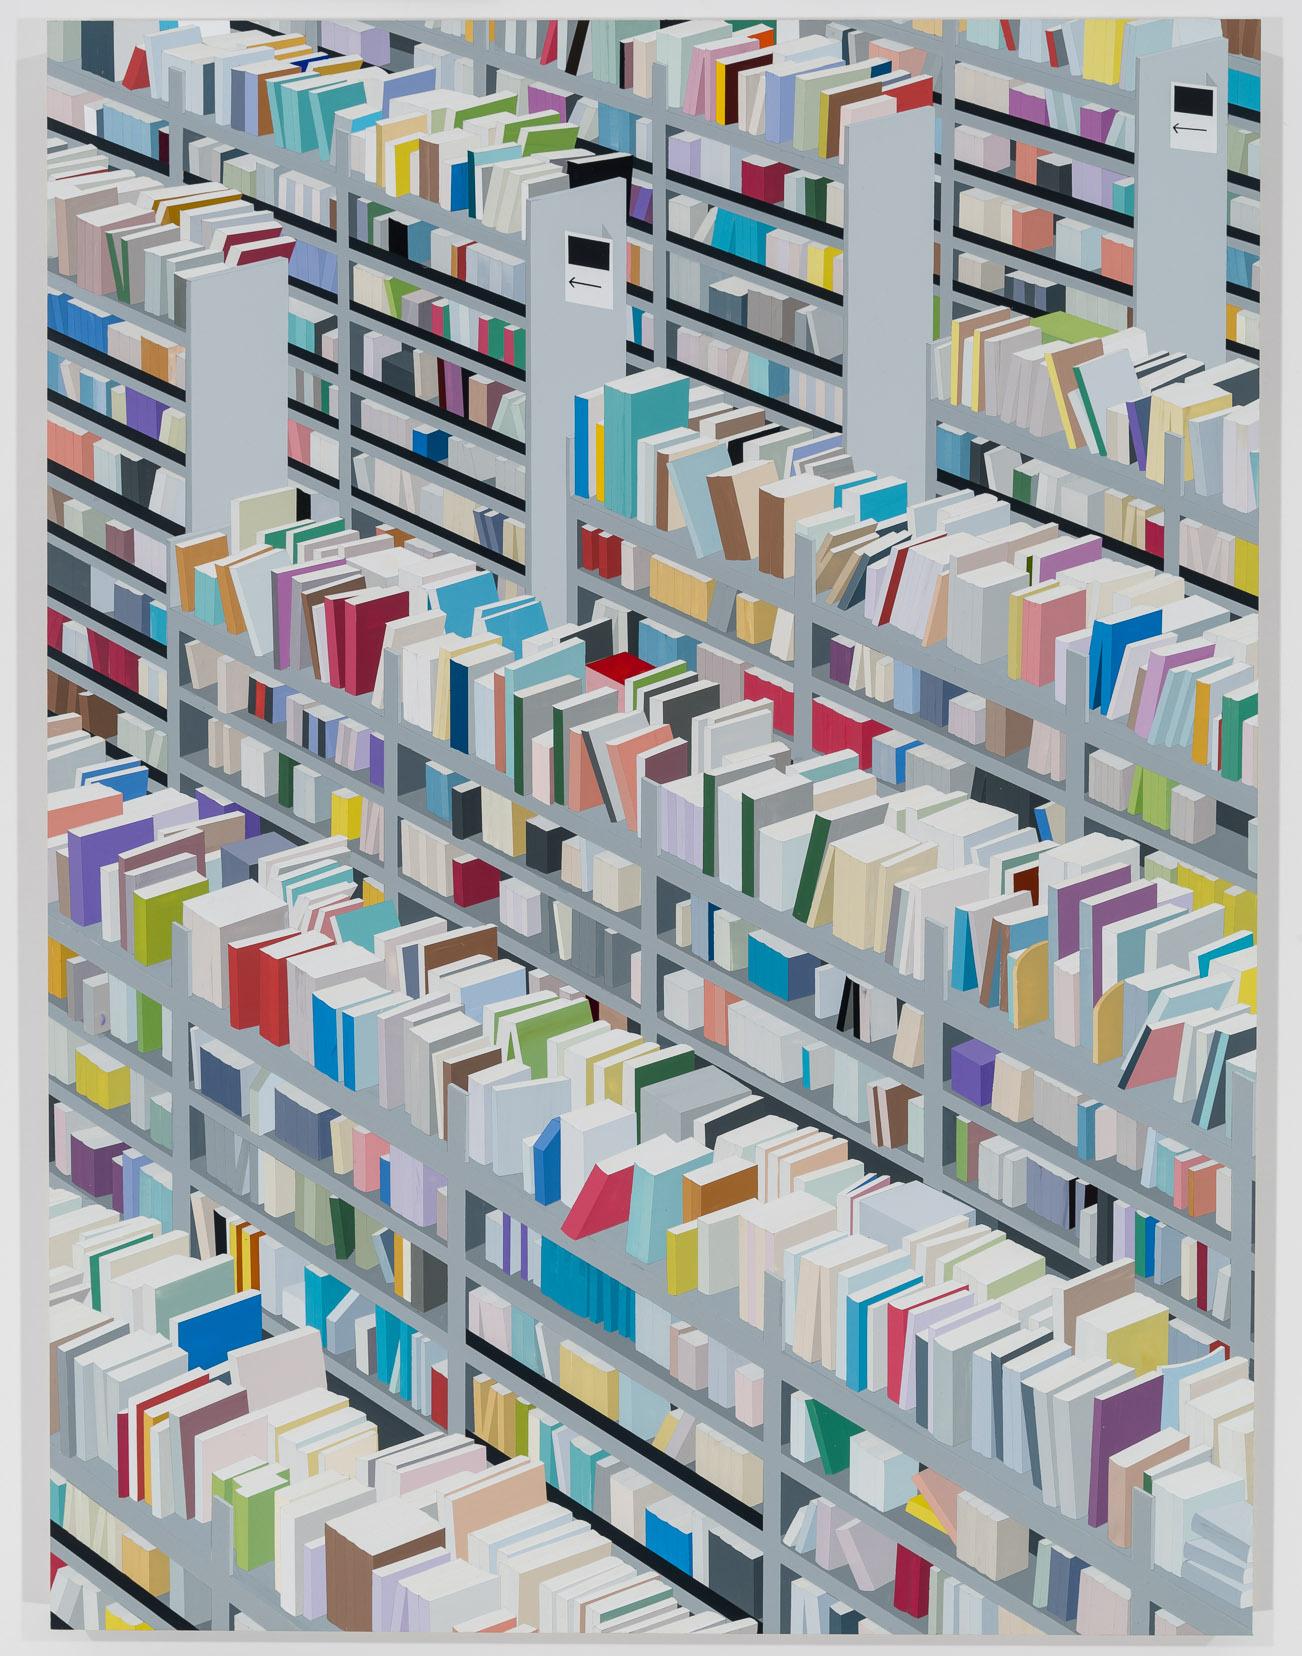 "Amazon Books (Small Version), 2017. Acrylic on Dibond, 32 x 24"""